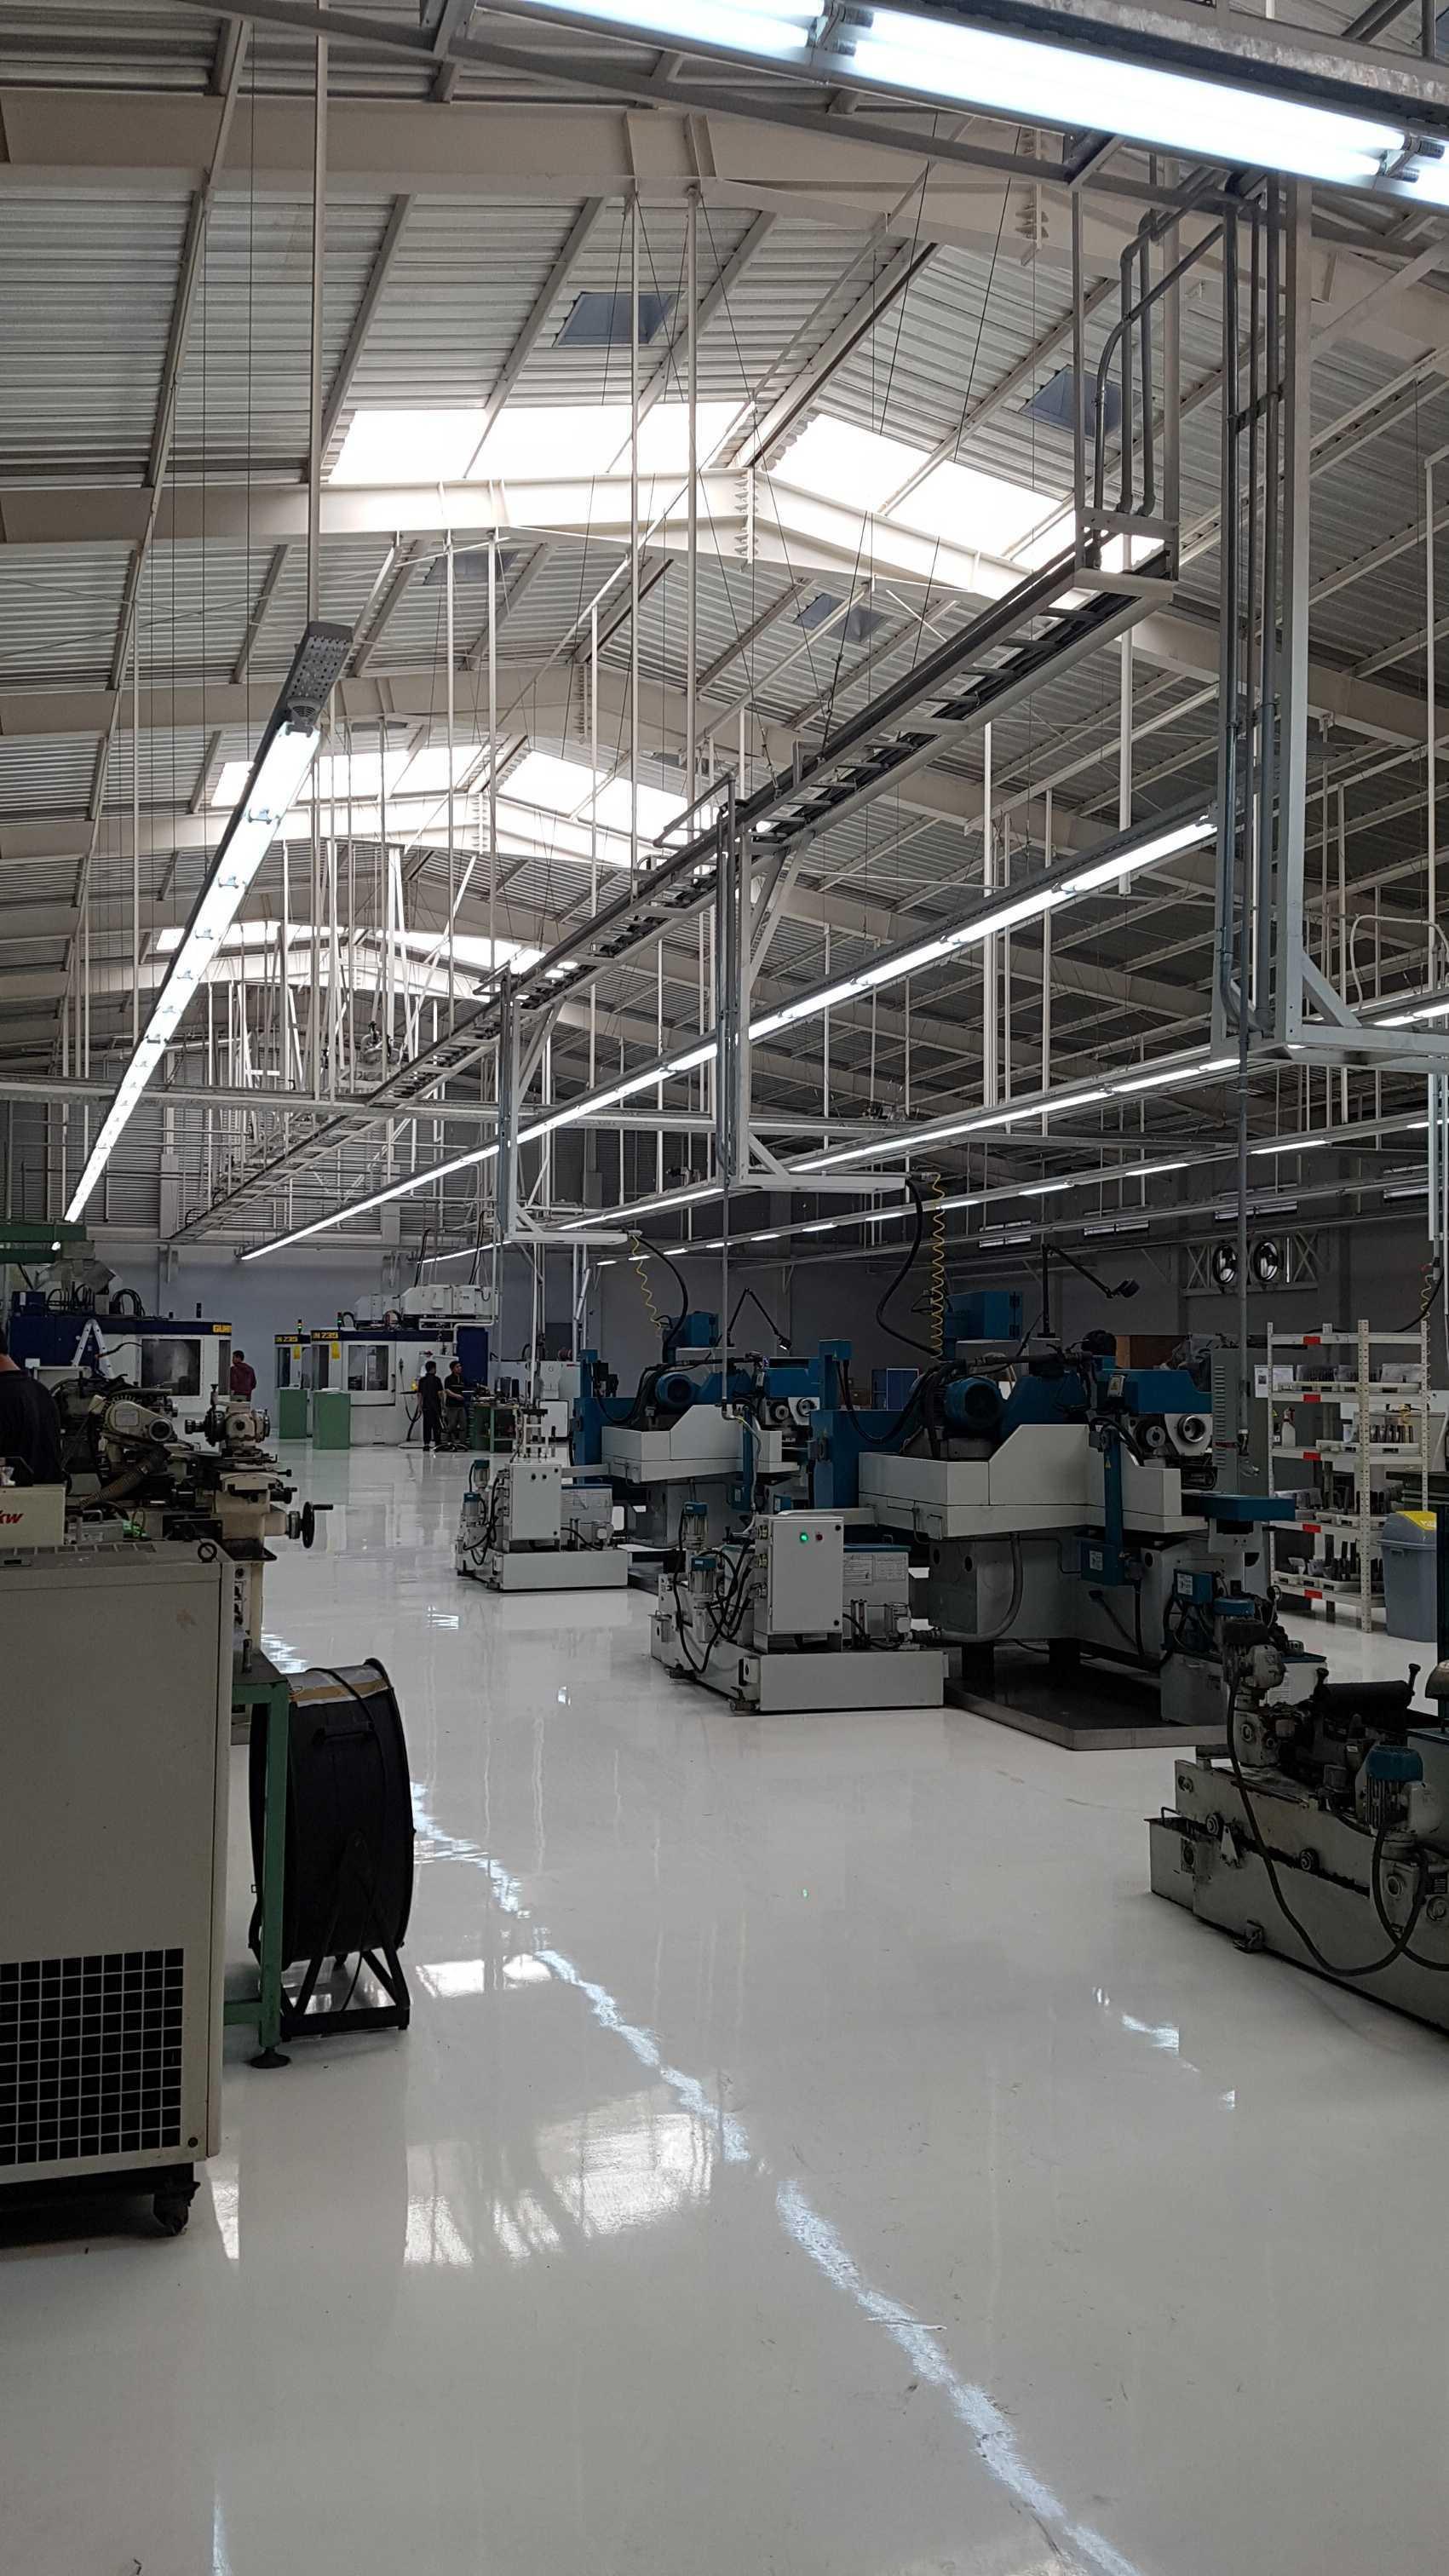 Kotak Design Guhring Factory Cikarang, Bekasi, Jawa Barat, Indonesia Cikarang, Bekasi, Jawa Barat, Indonesia Kotak-Design-Guhring-Factory   77842